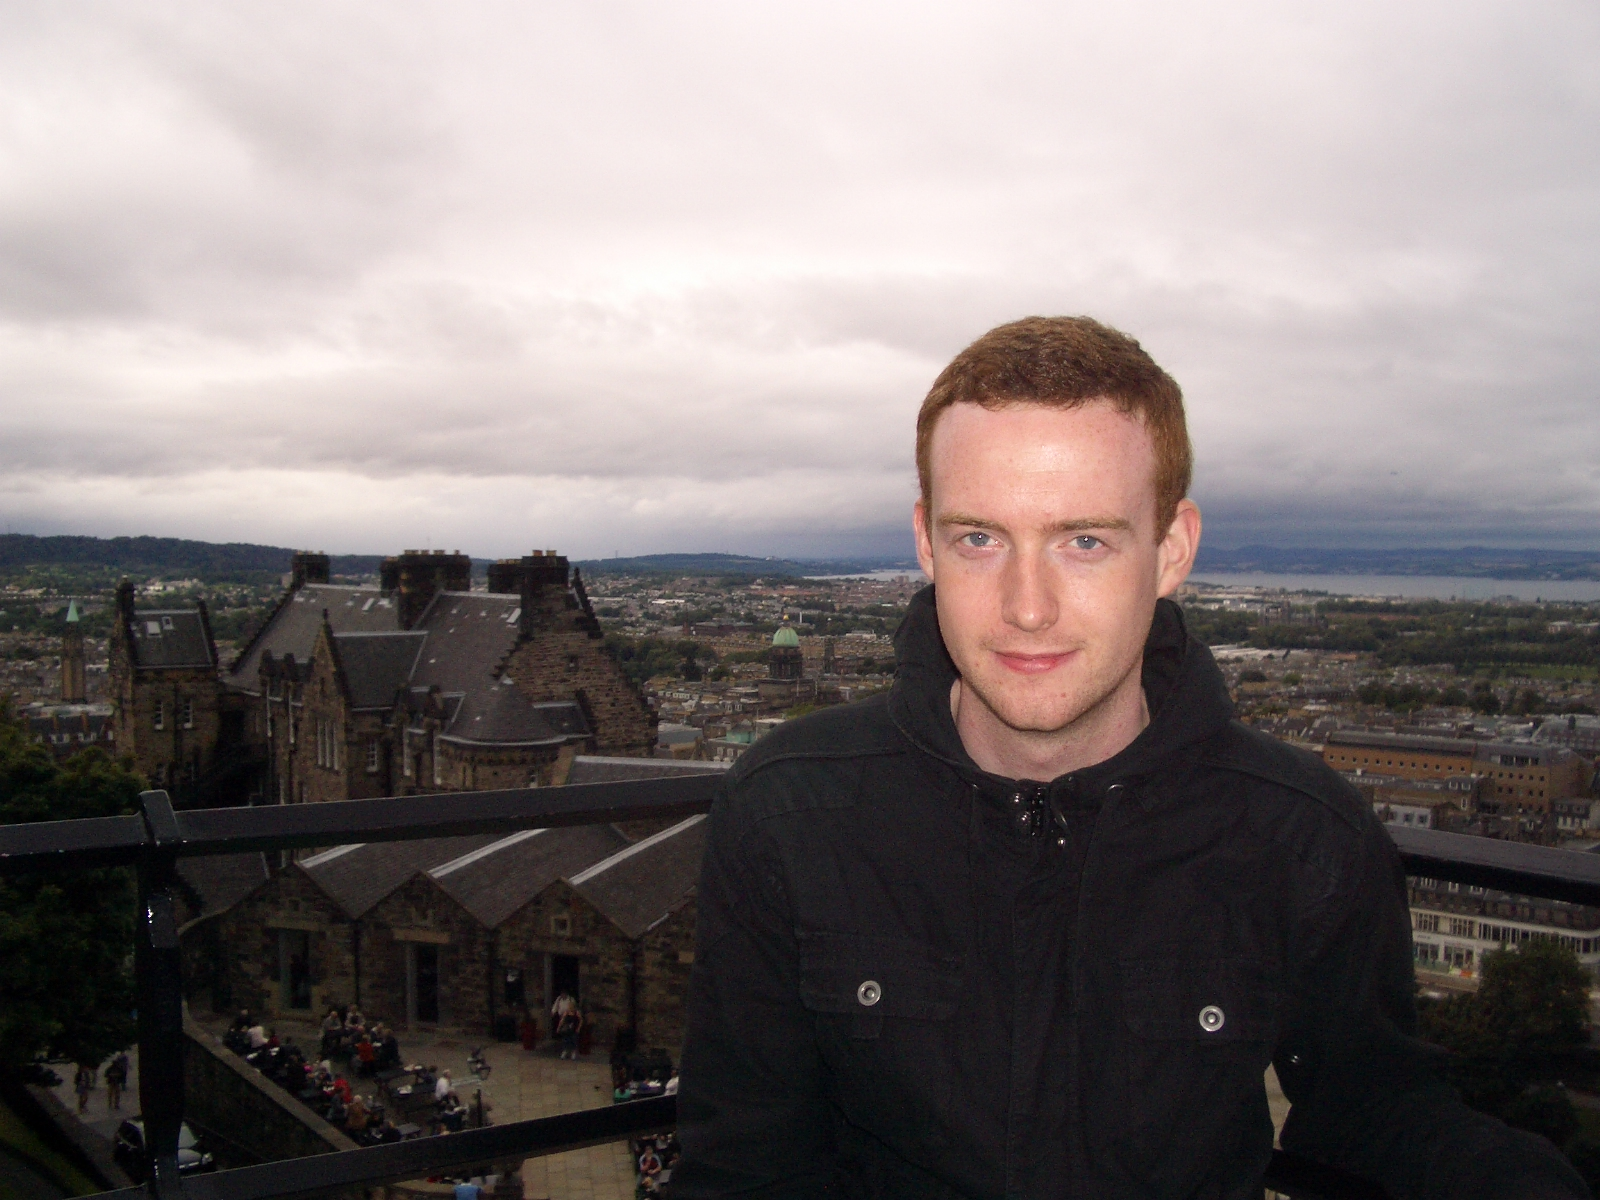 Gavin Craig